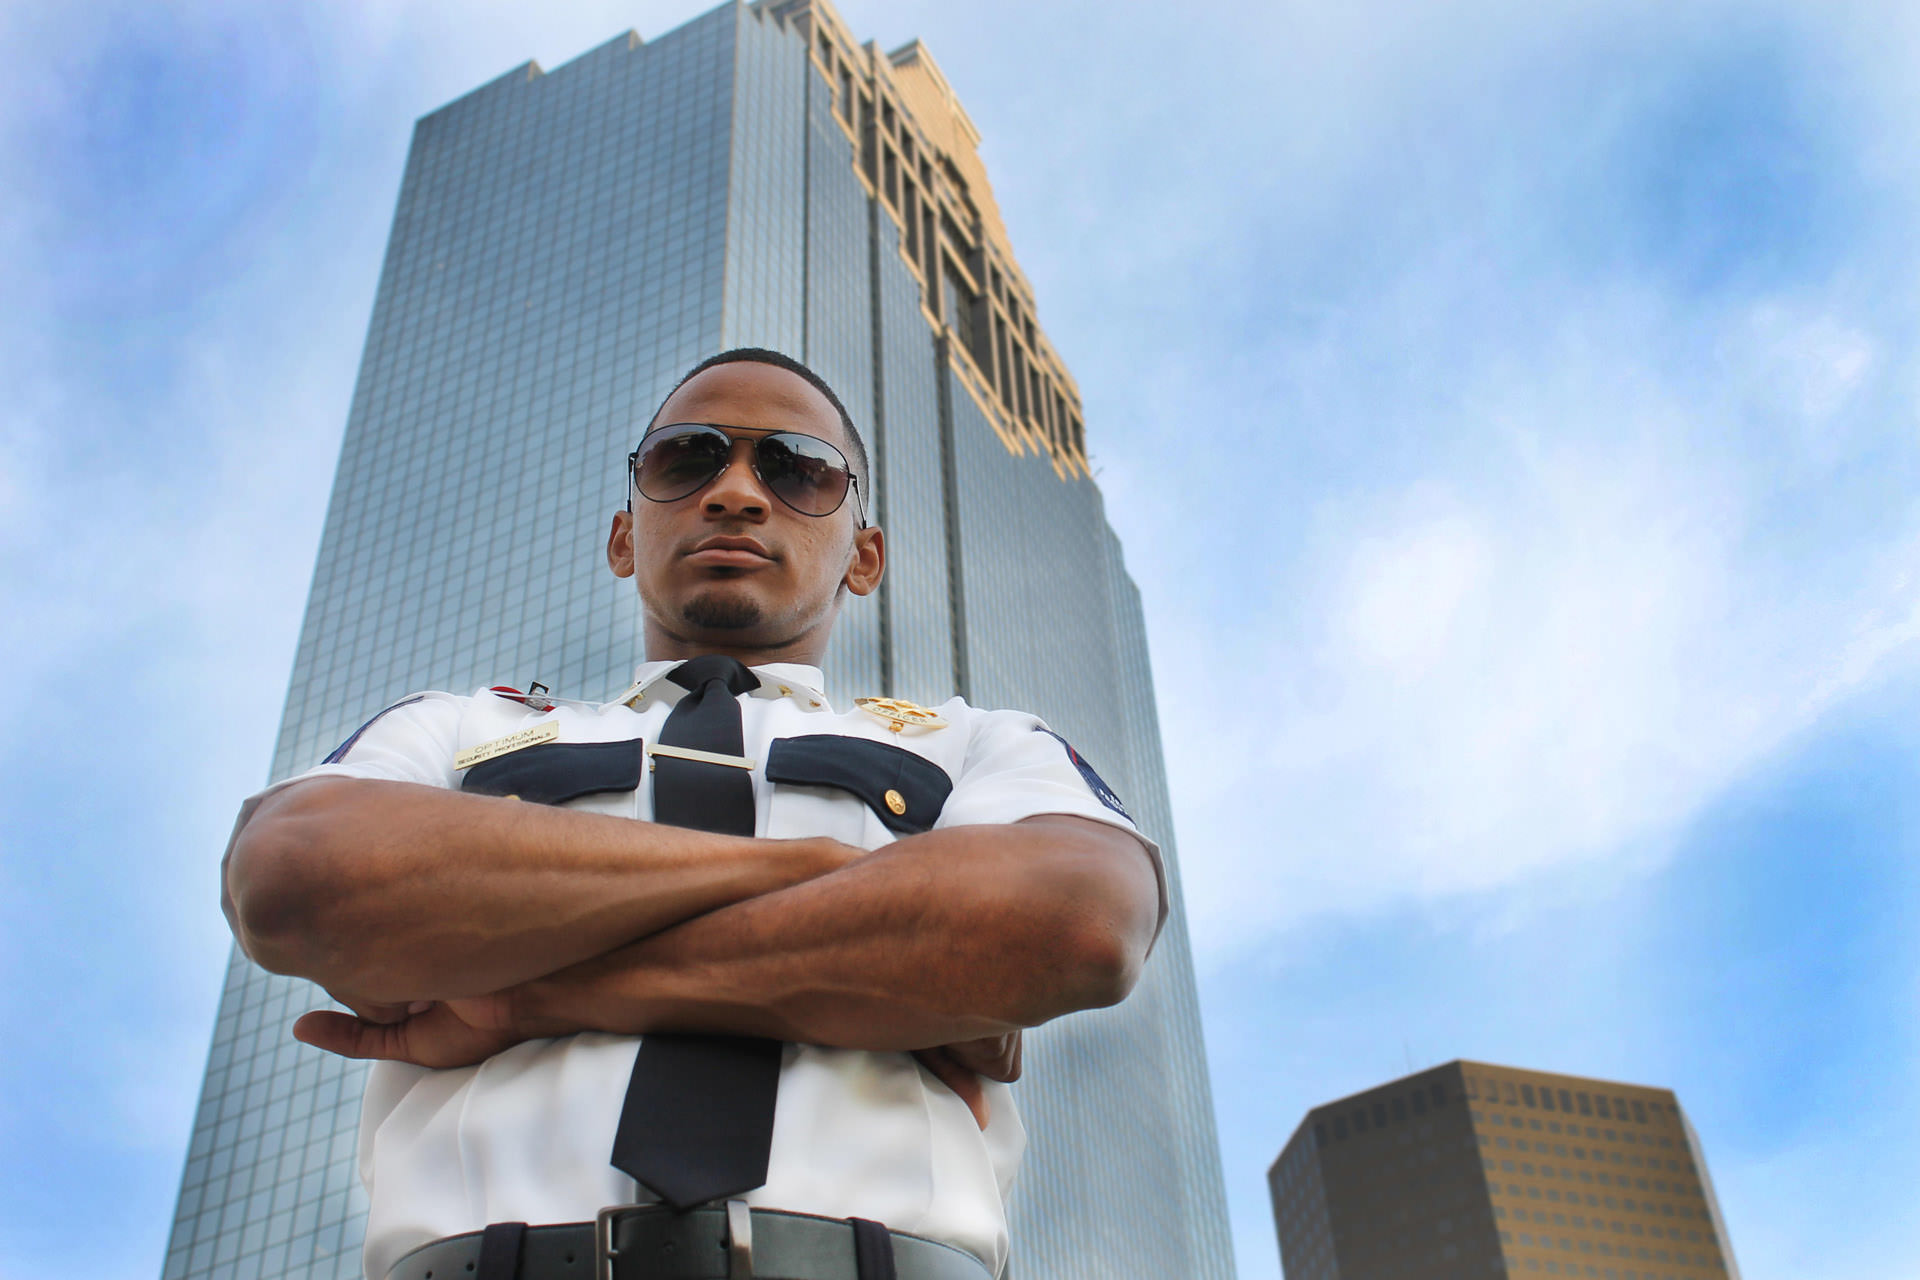 Optimum security guard protecting an office building.